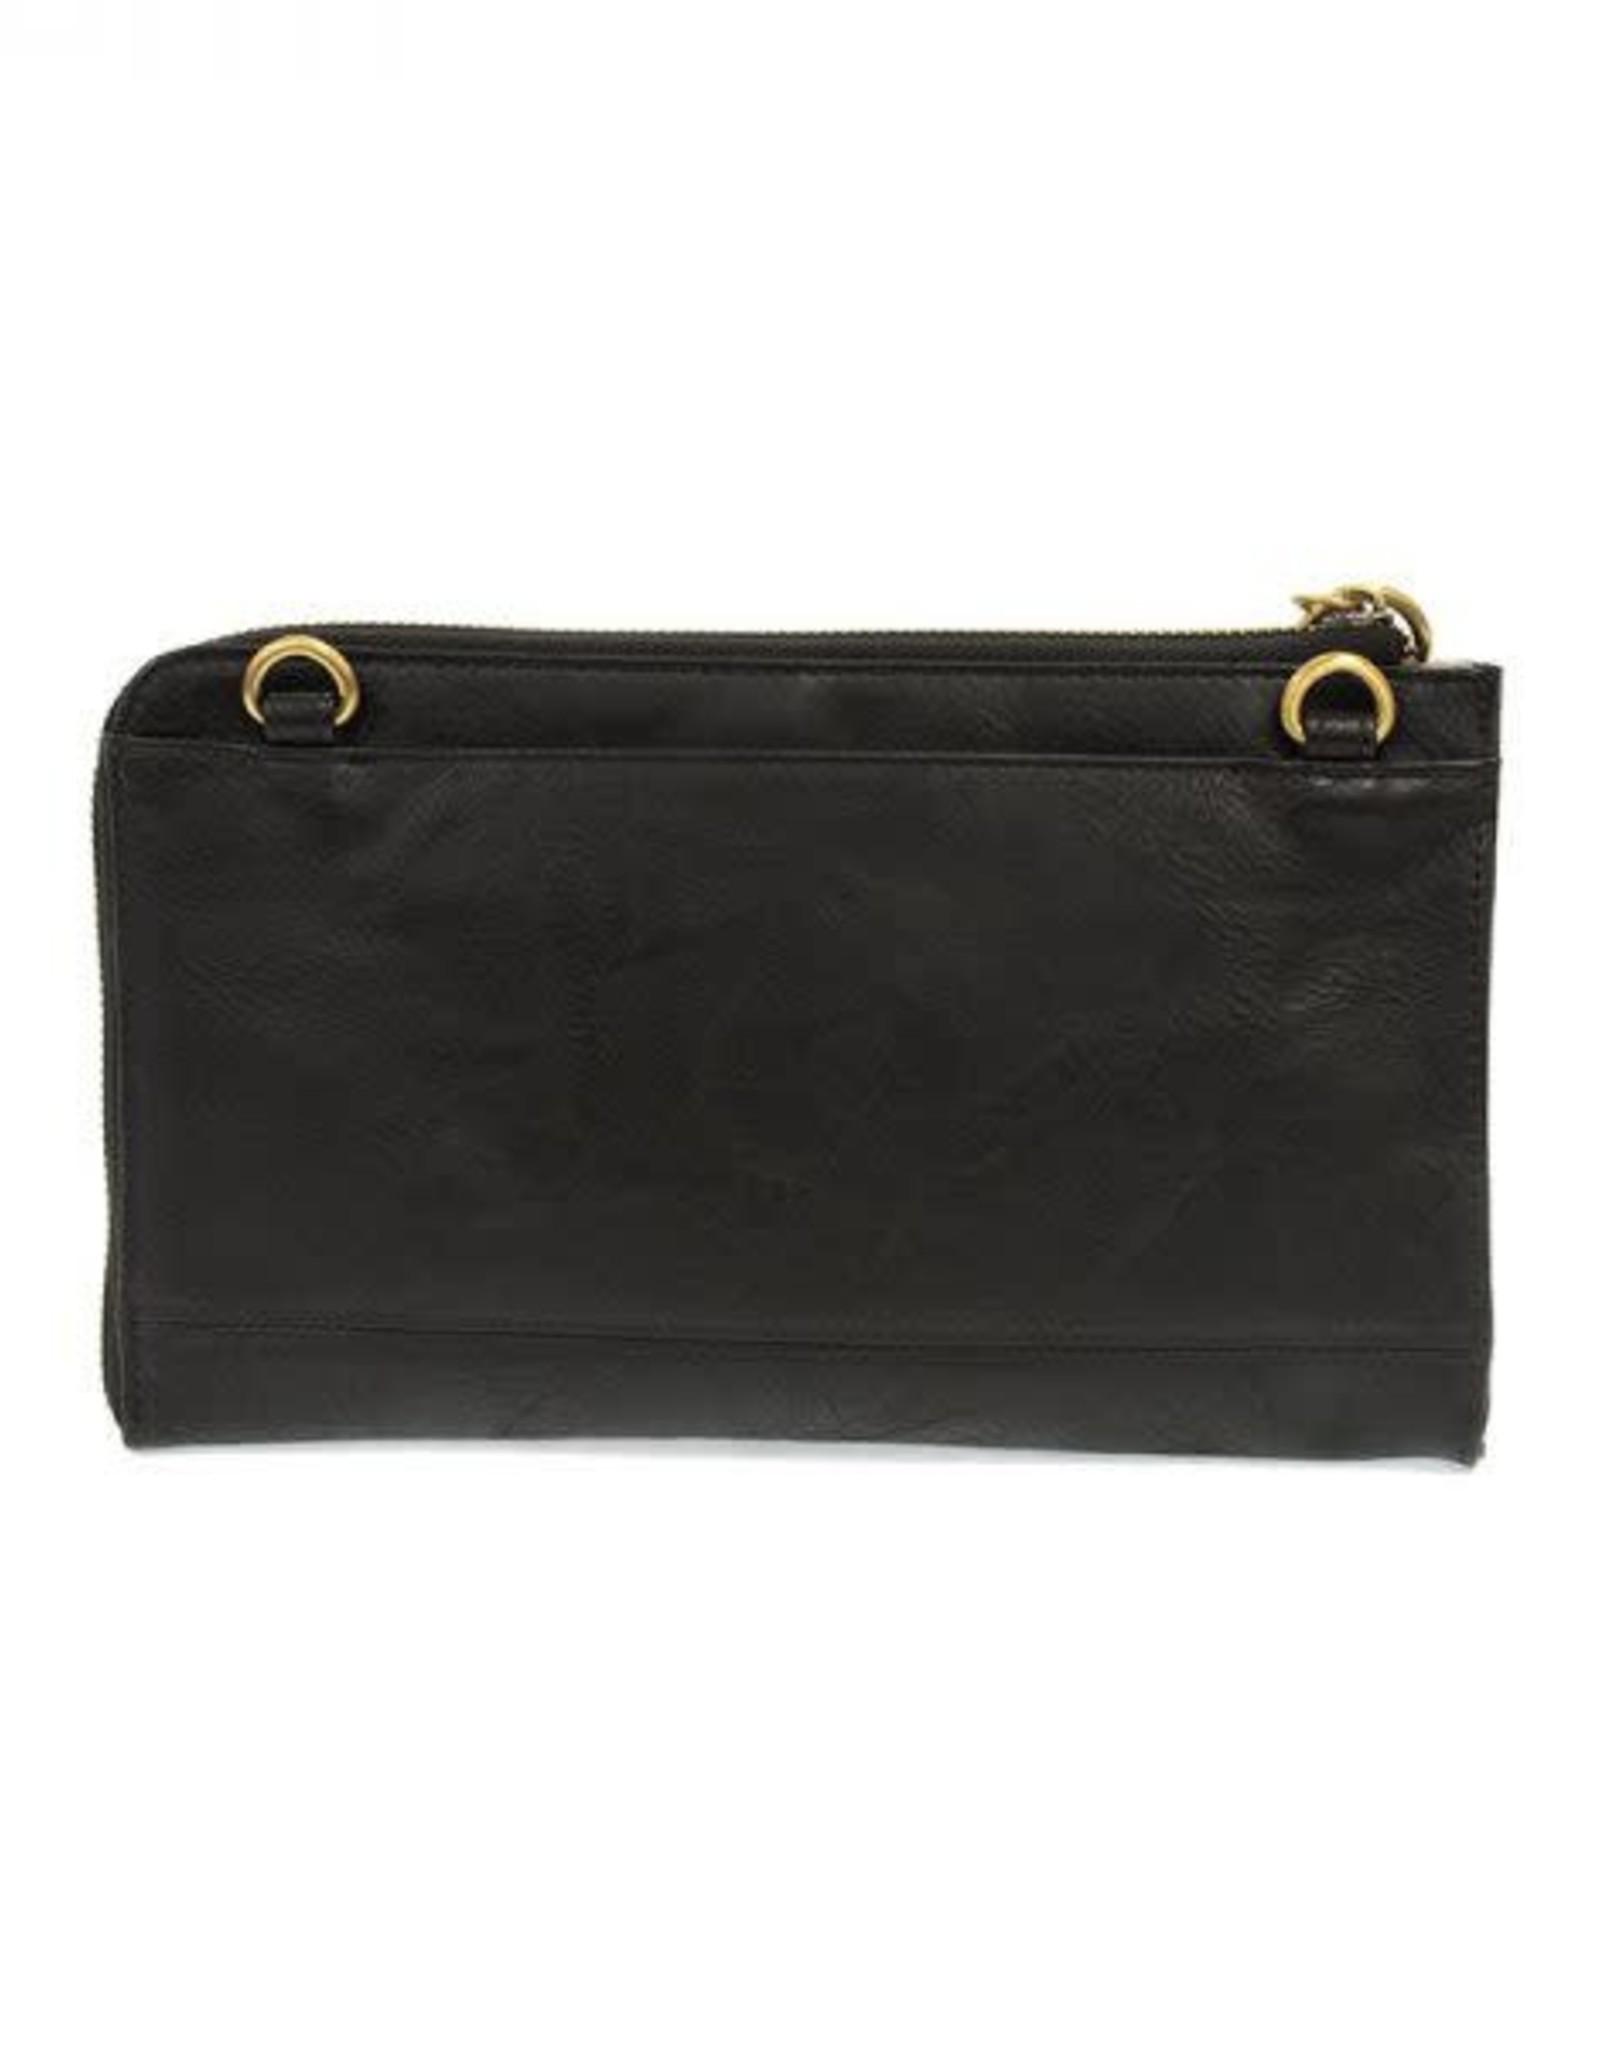 - Black Convertible Wristlet & Wallet